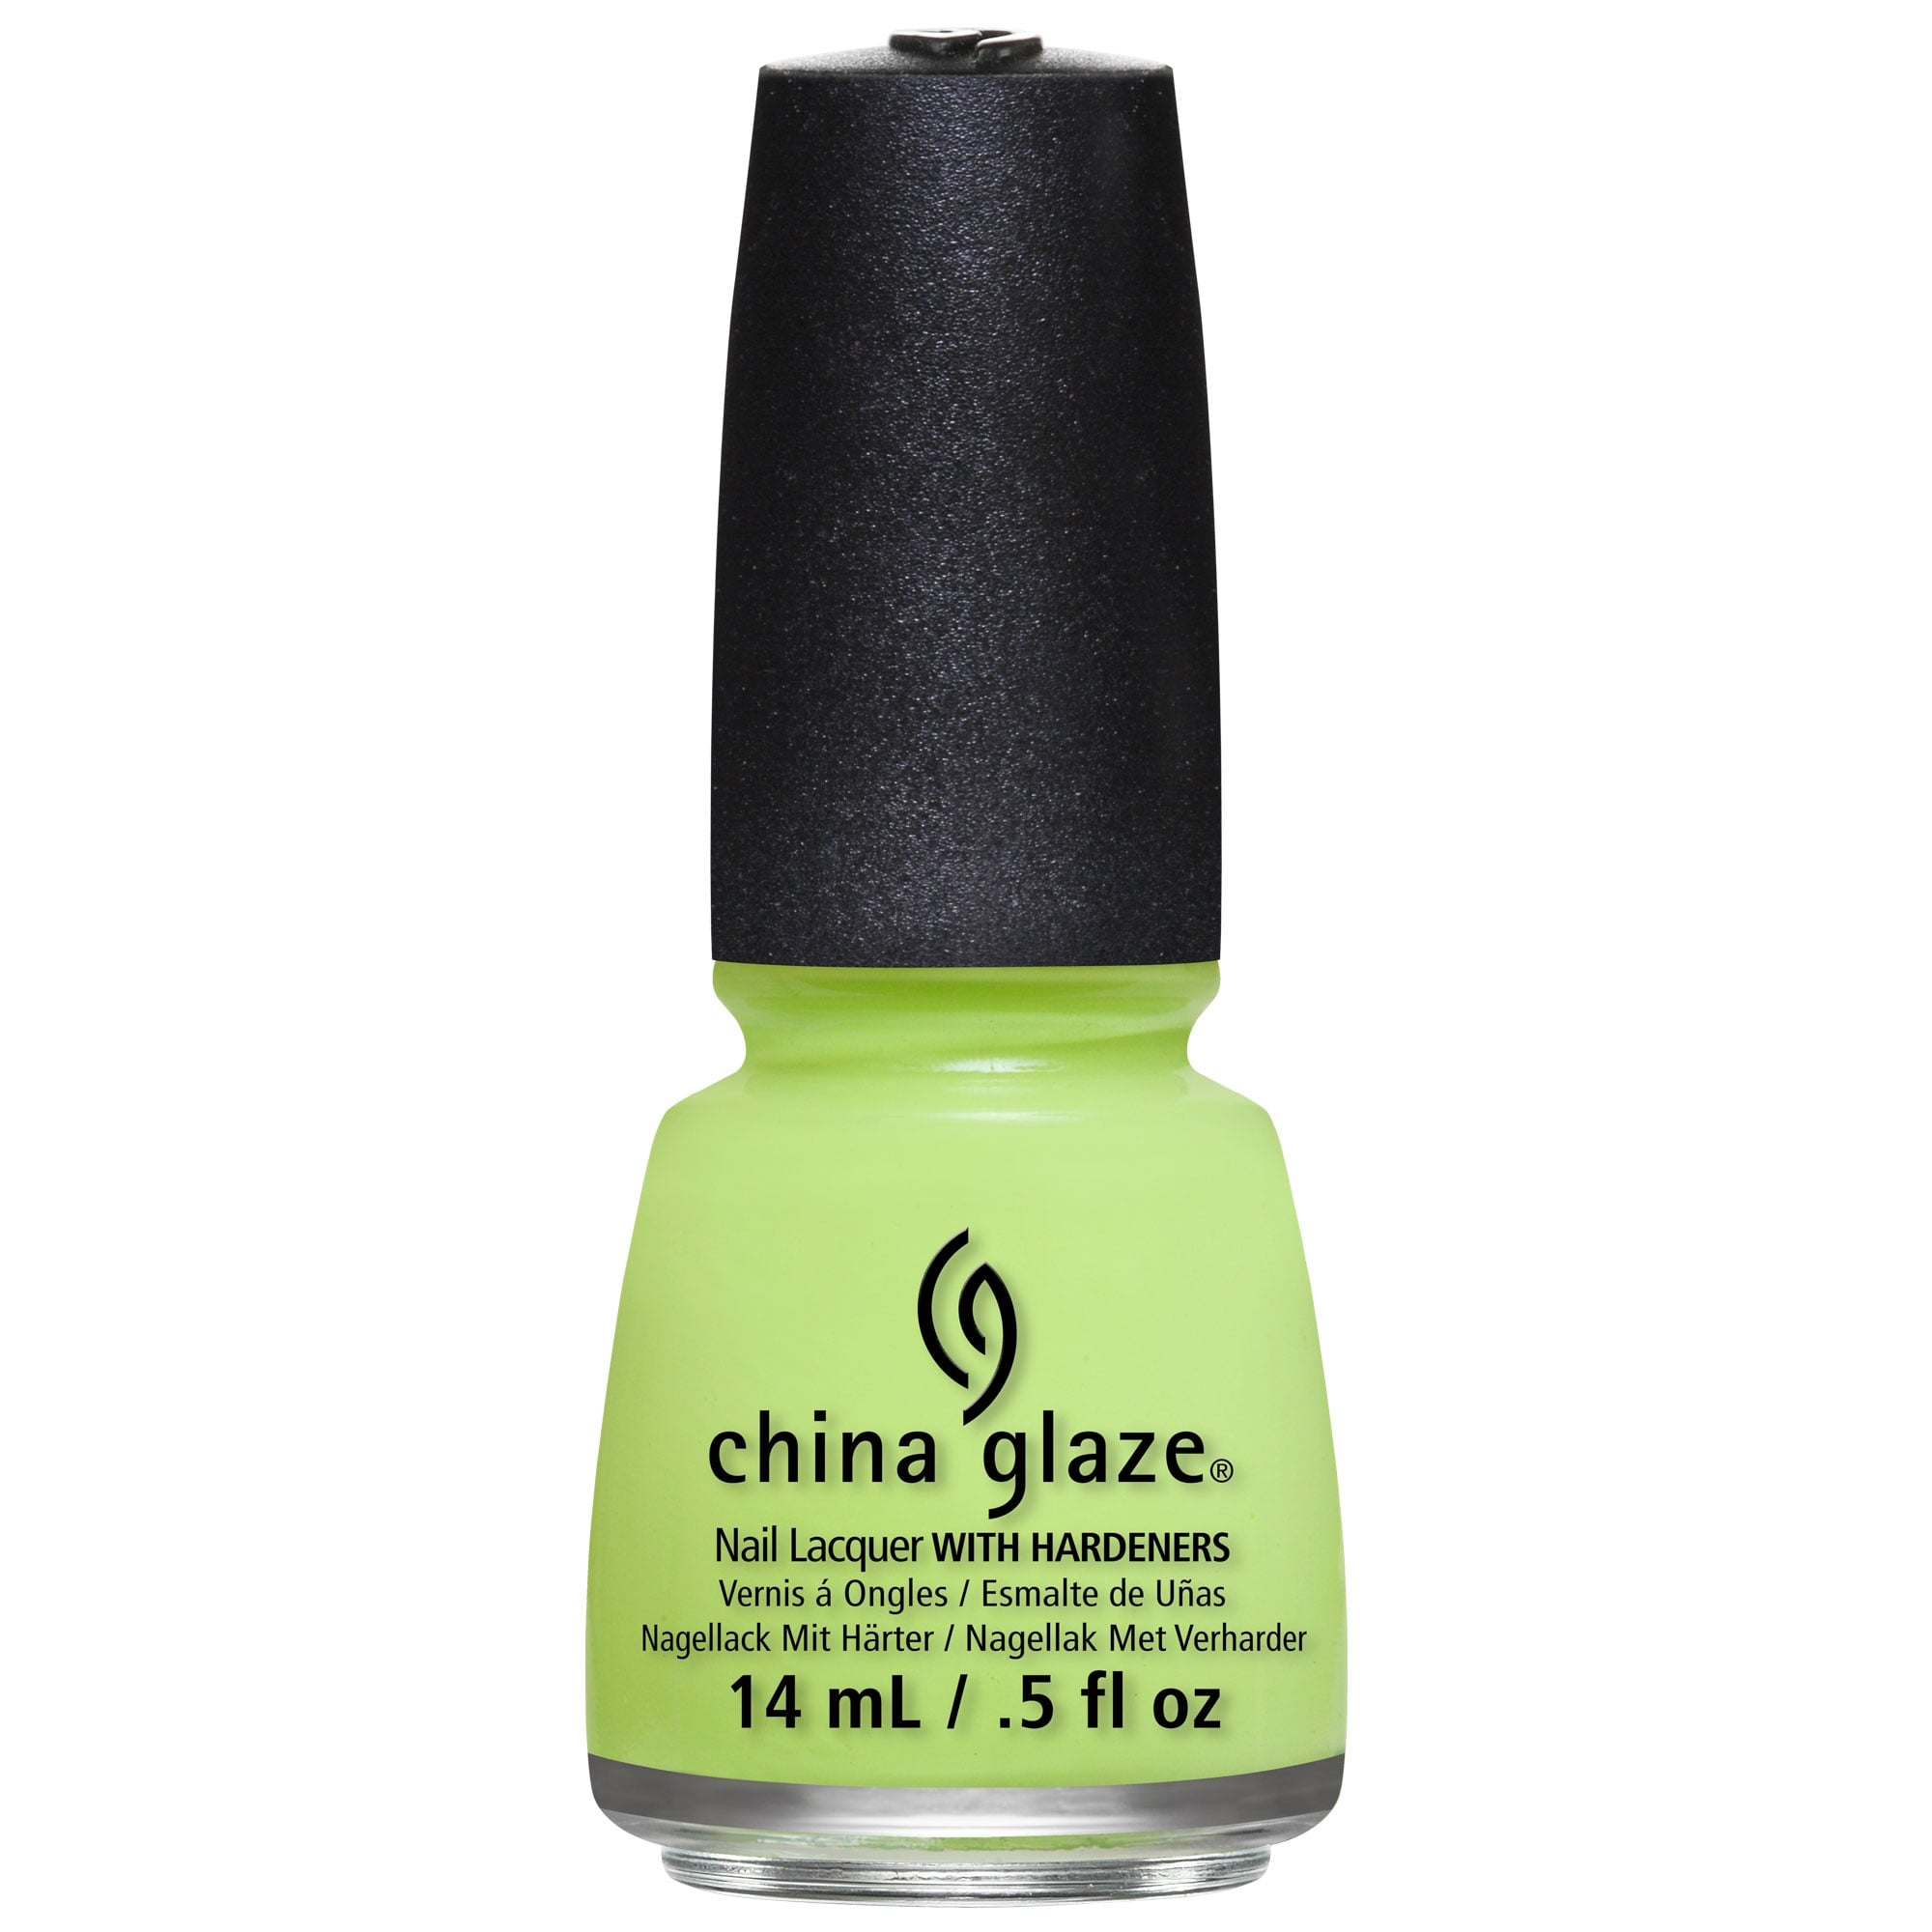 China Glaze City Flourish Nail Polish Collection Grass Green Limer